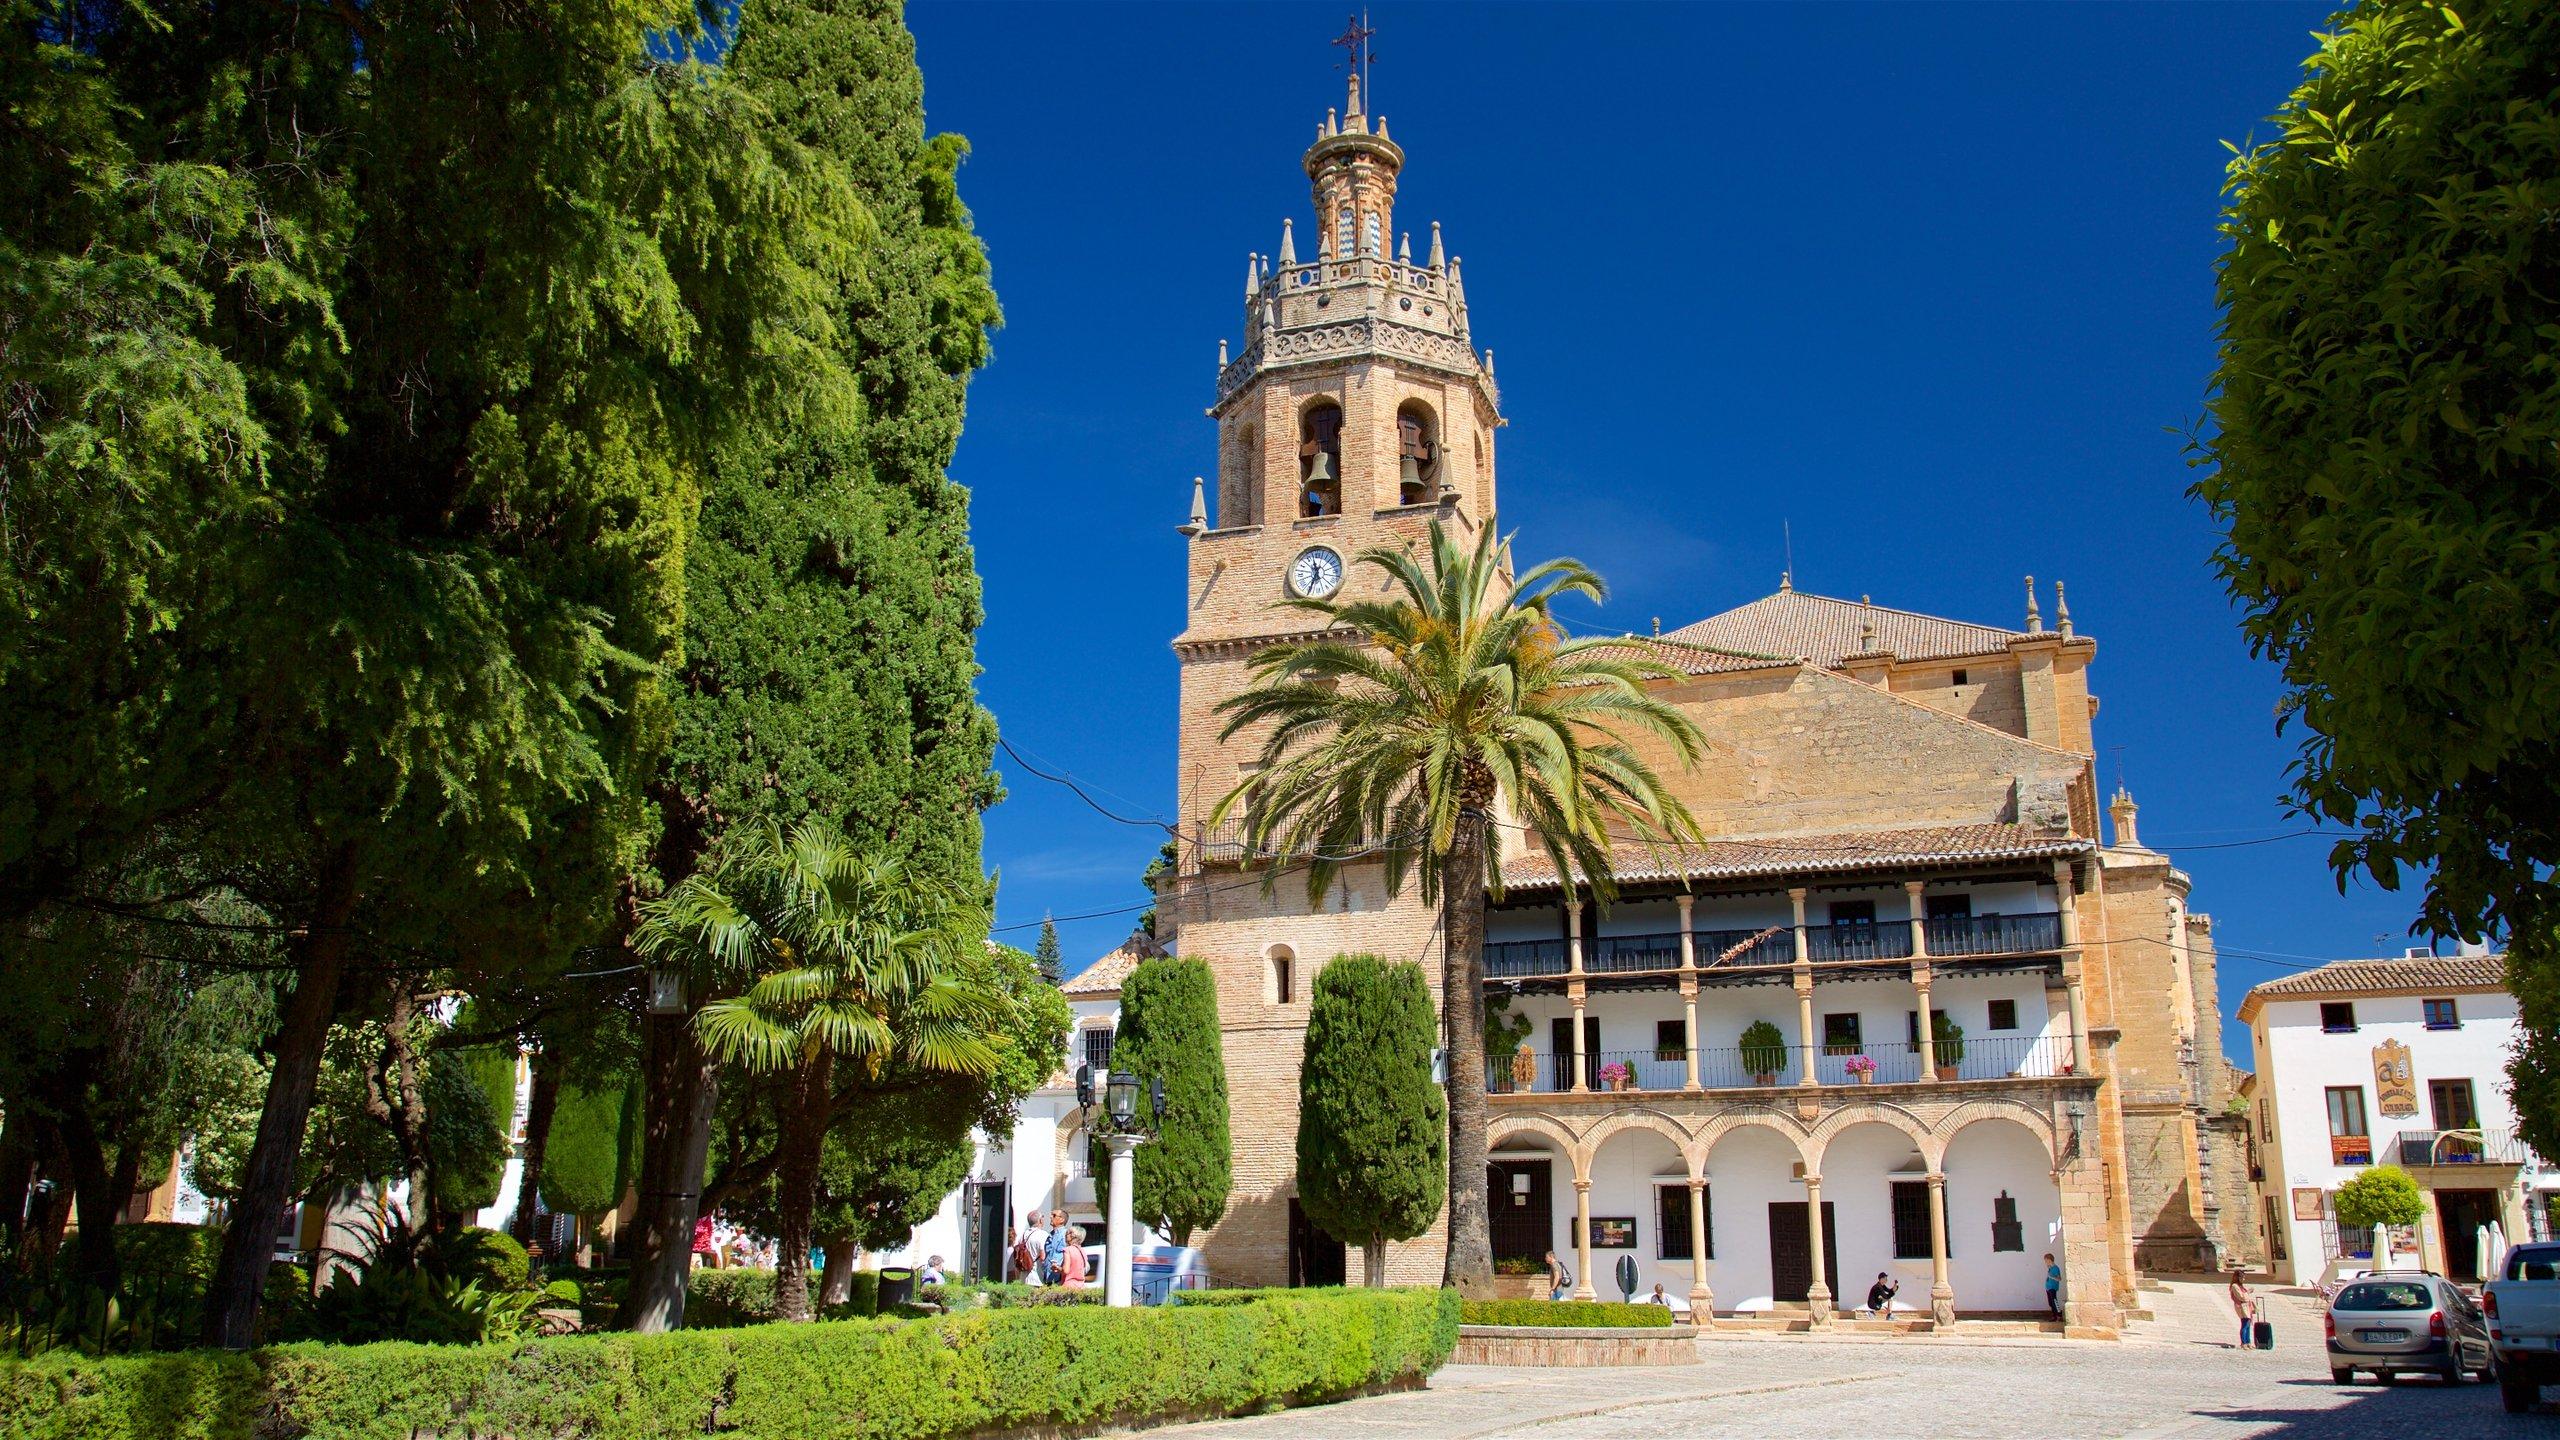 Old Town Ronda, Ronda, Andalusia, Spain